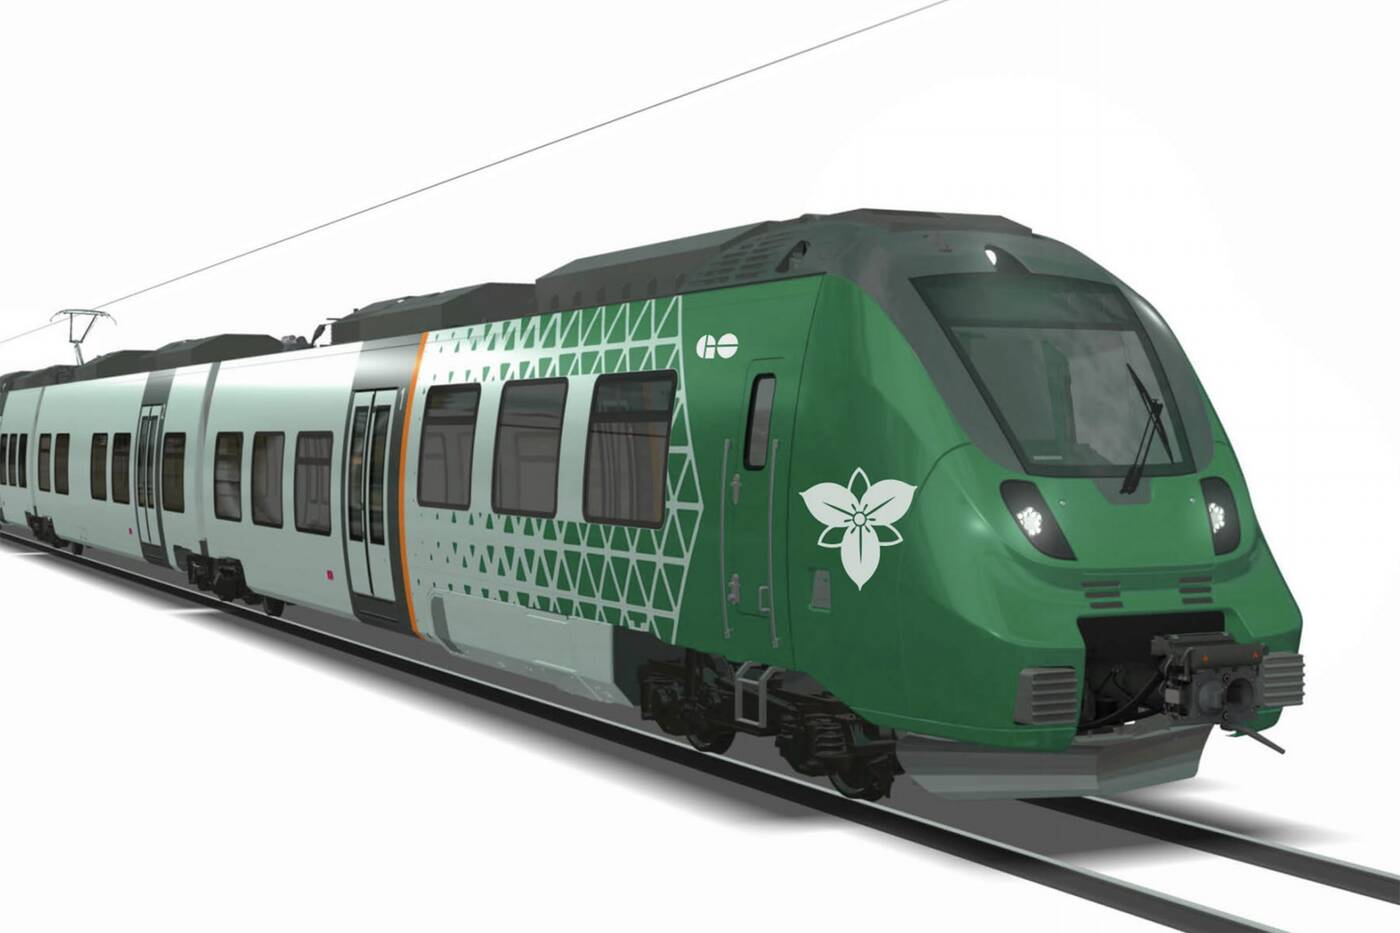 trillium regional rail network